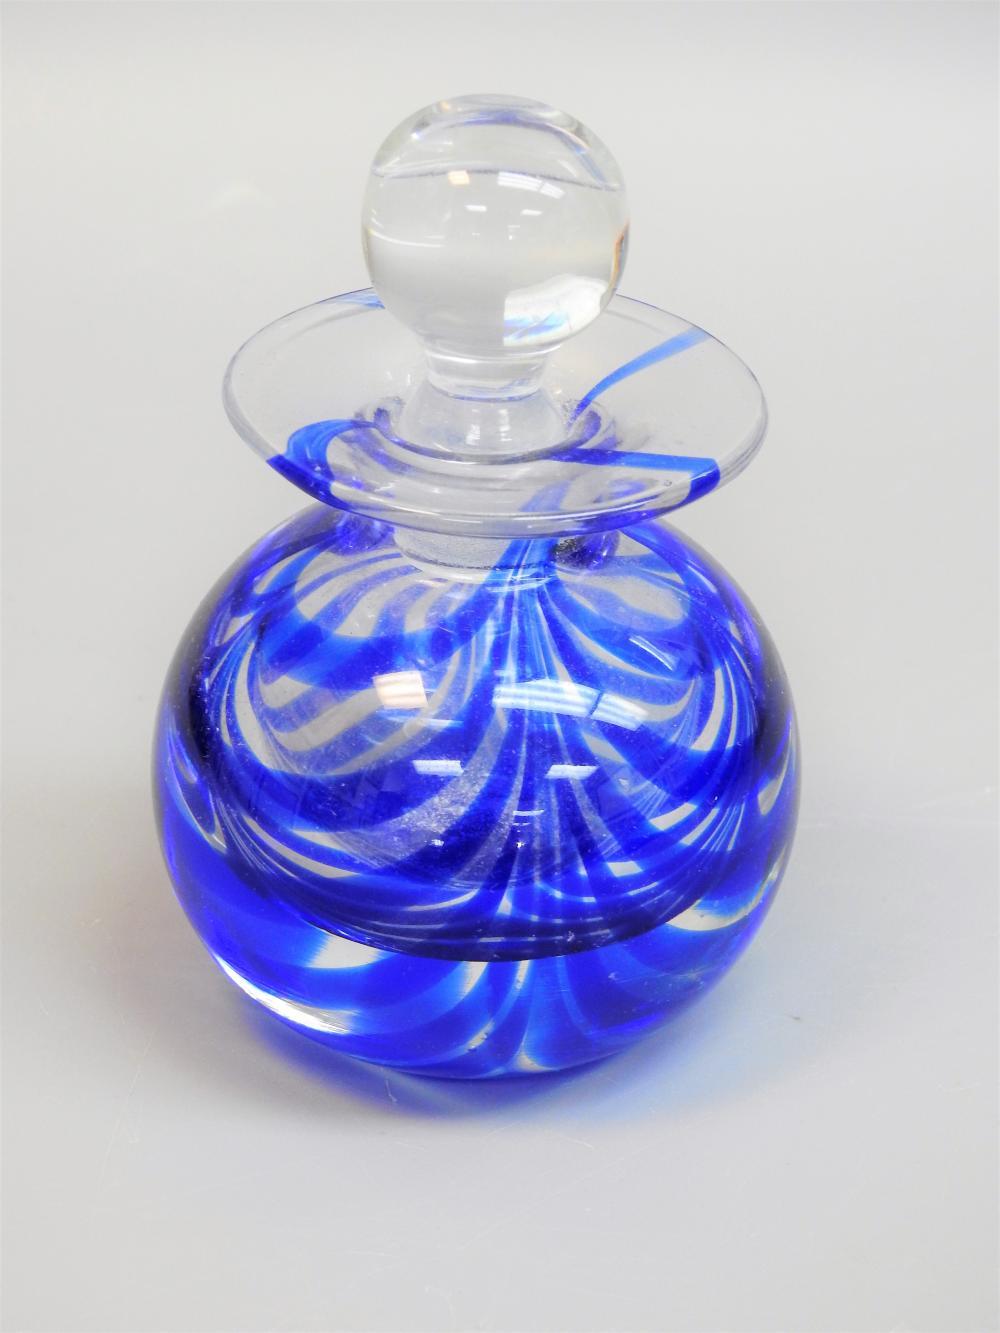 Lot 90M: VINTAGE MMA GLASS ART COBALT BLUE PERFUME BOTTLE